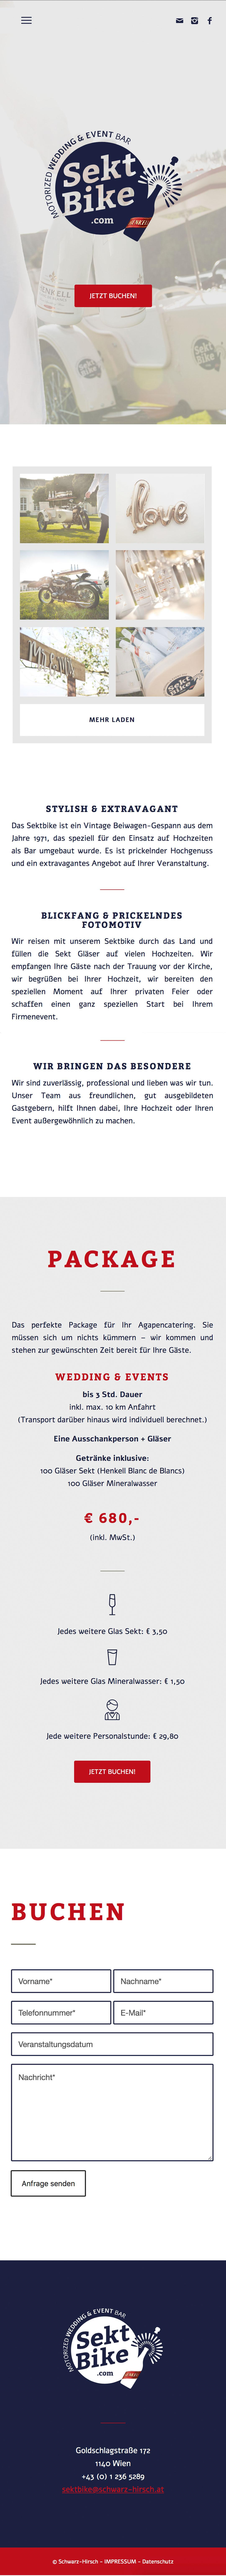 sektbike website